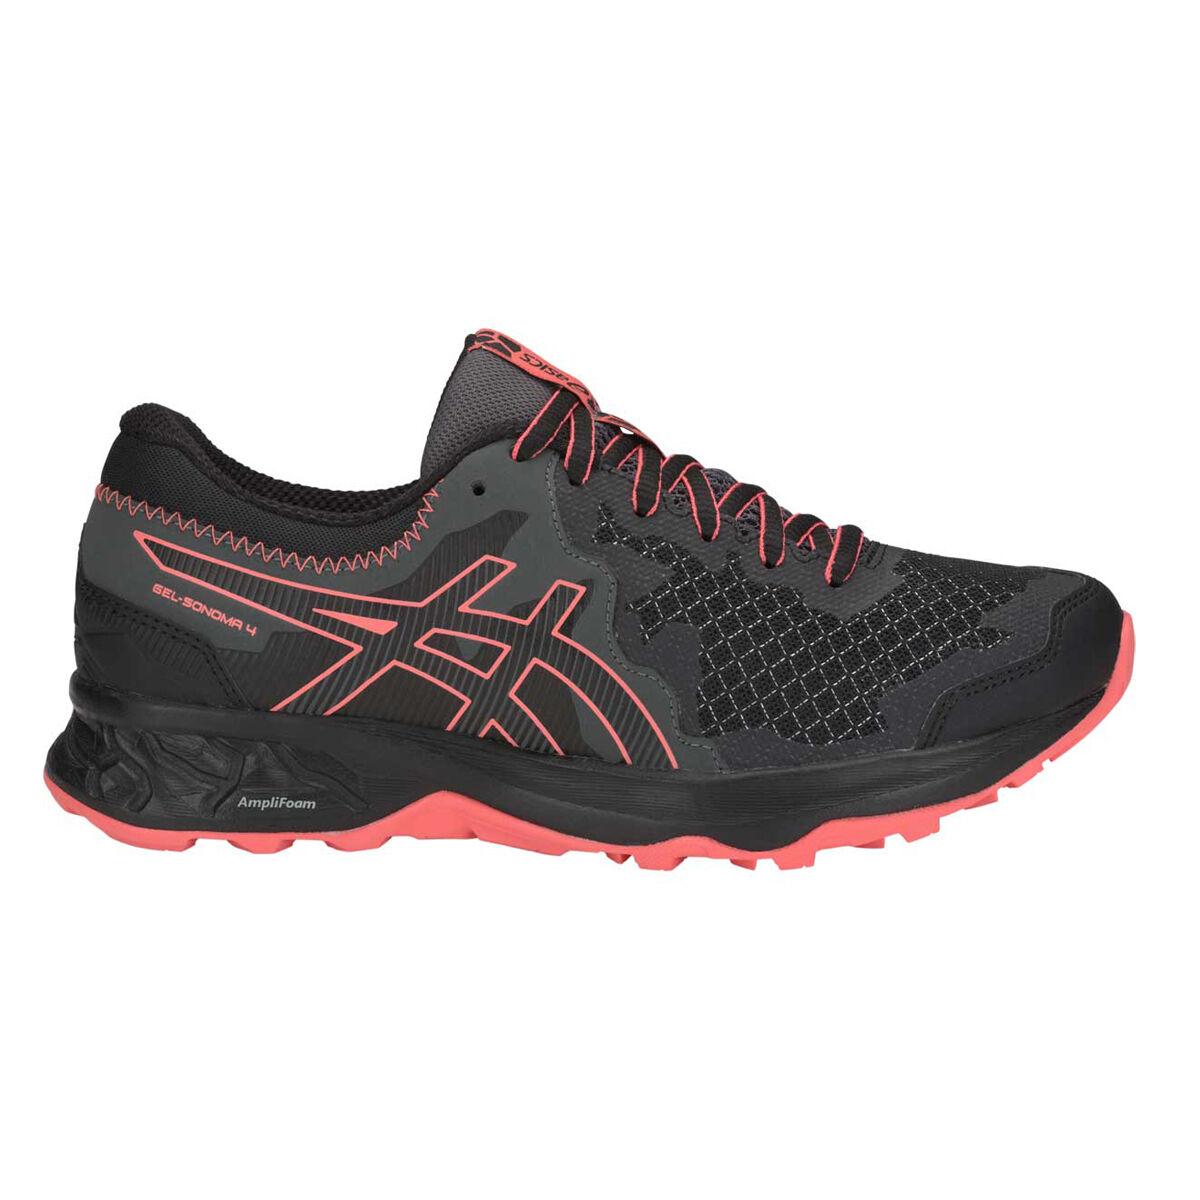 Asics GEL Sonoma 4 D Womens Trail Running Shoes